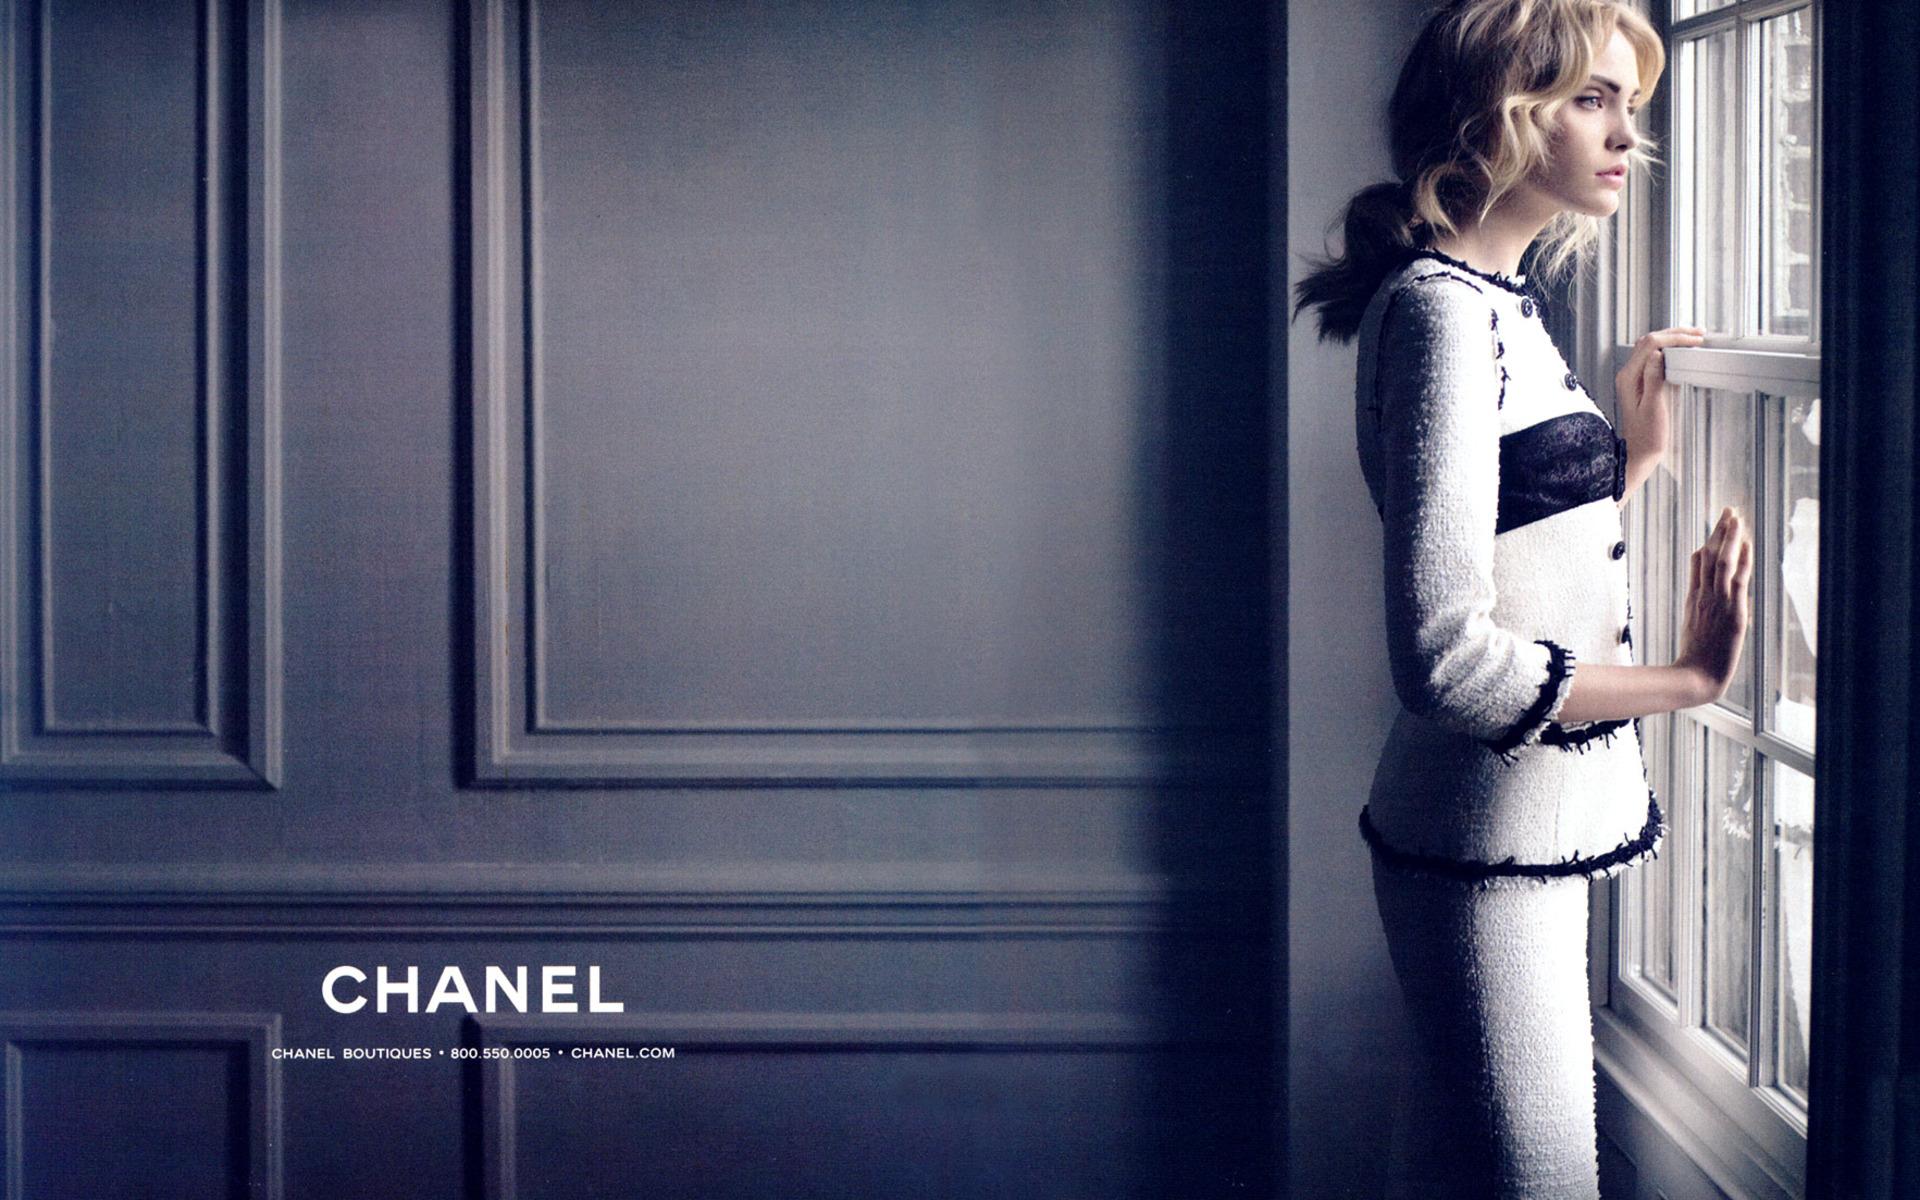 Chanel Wallpaper 1920x1200